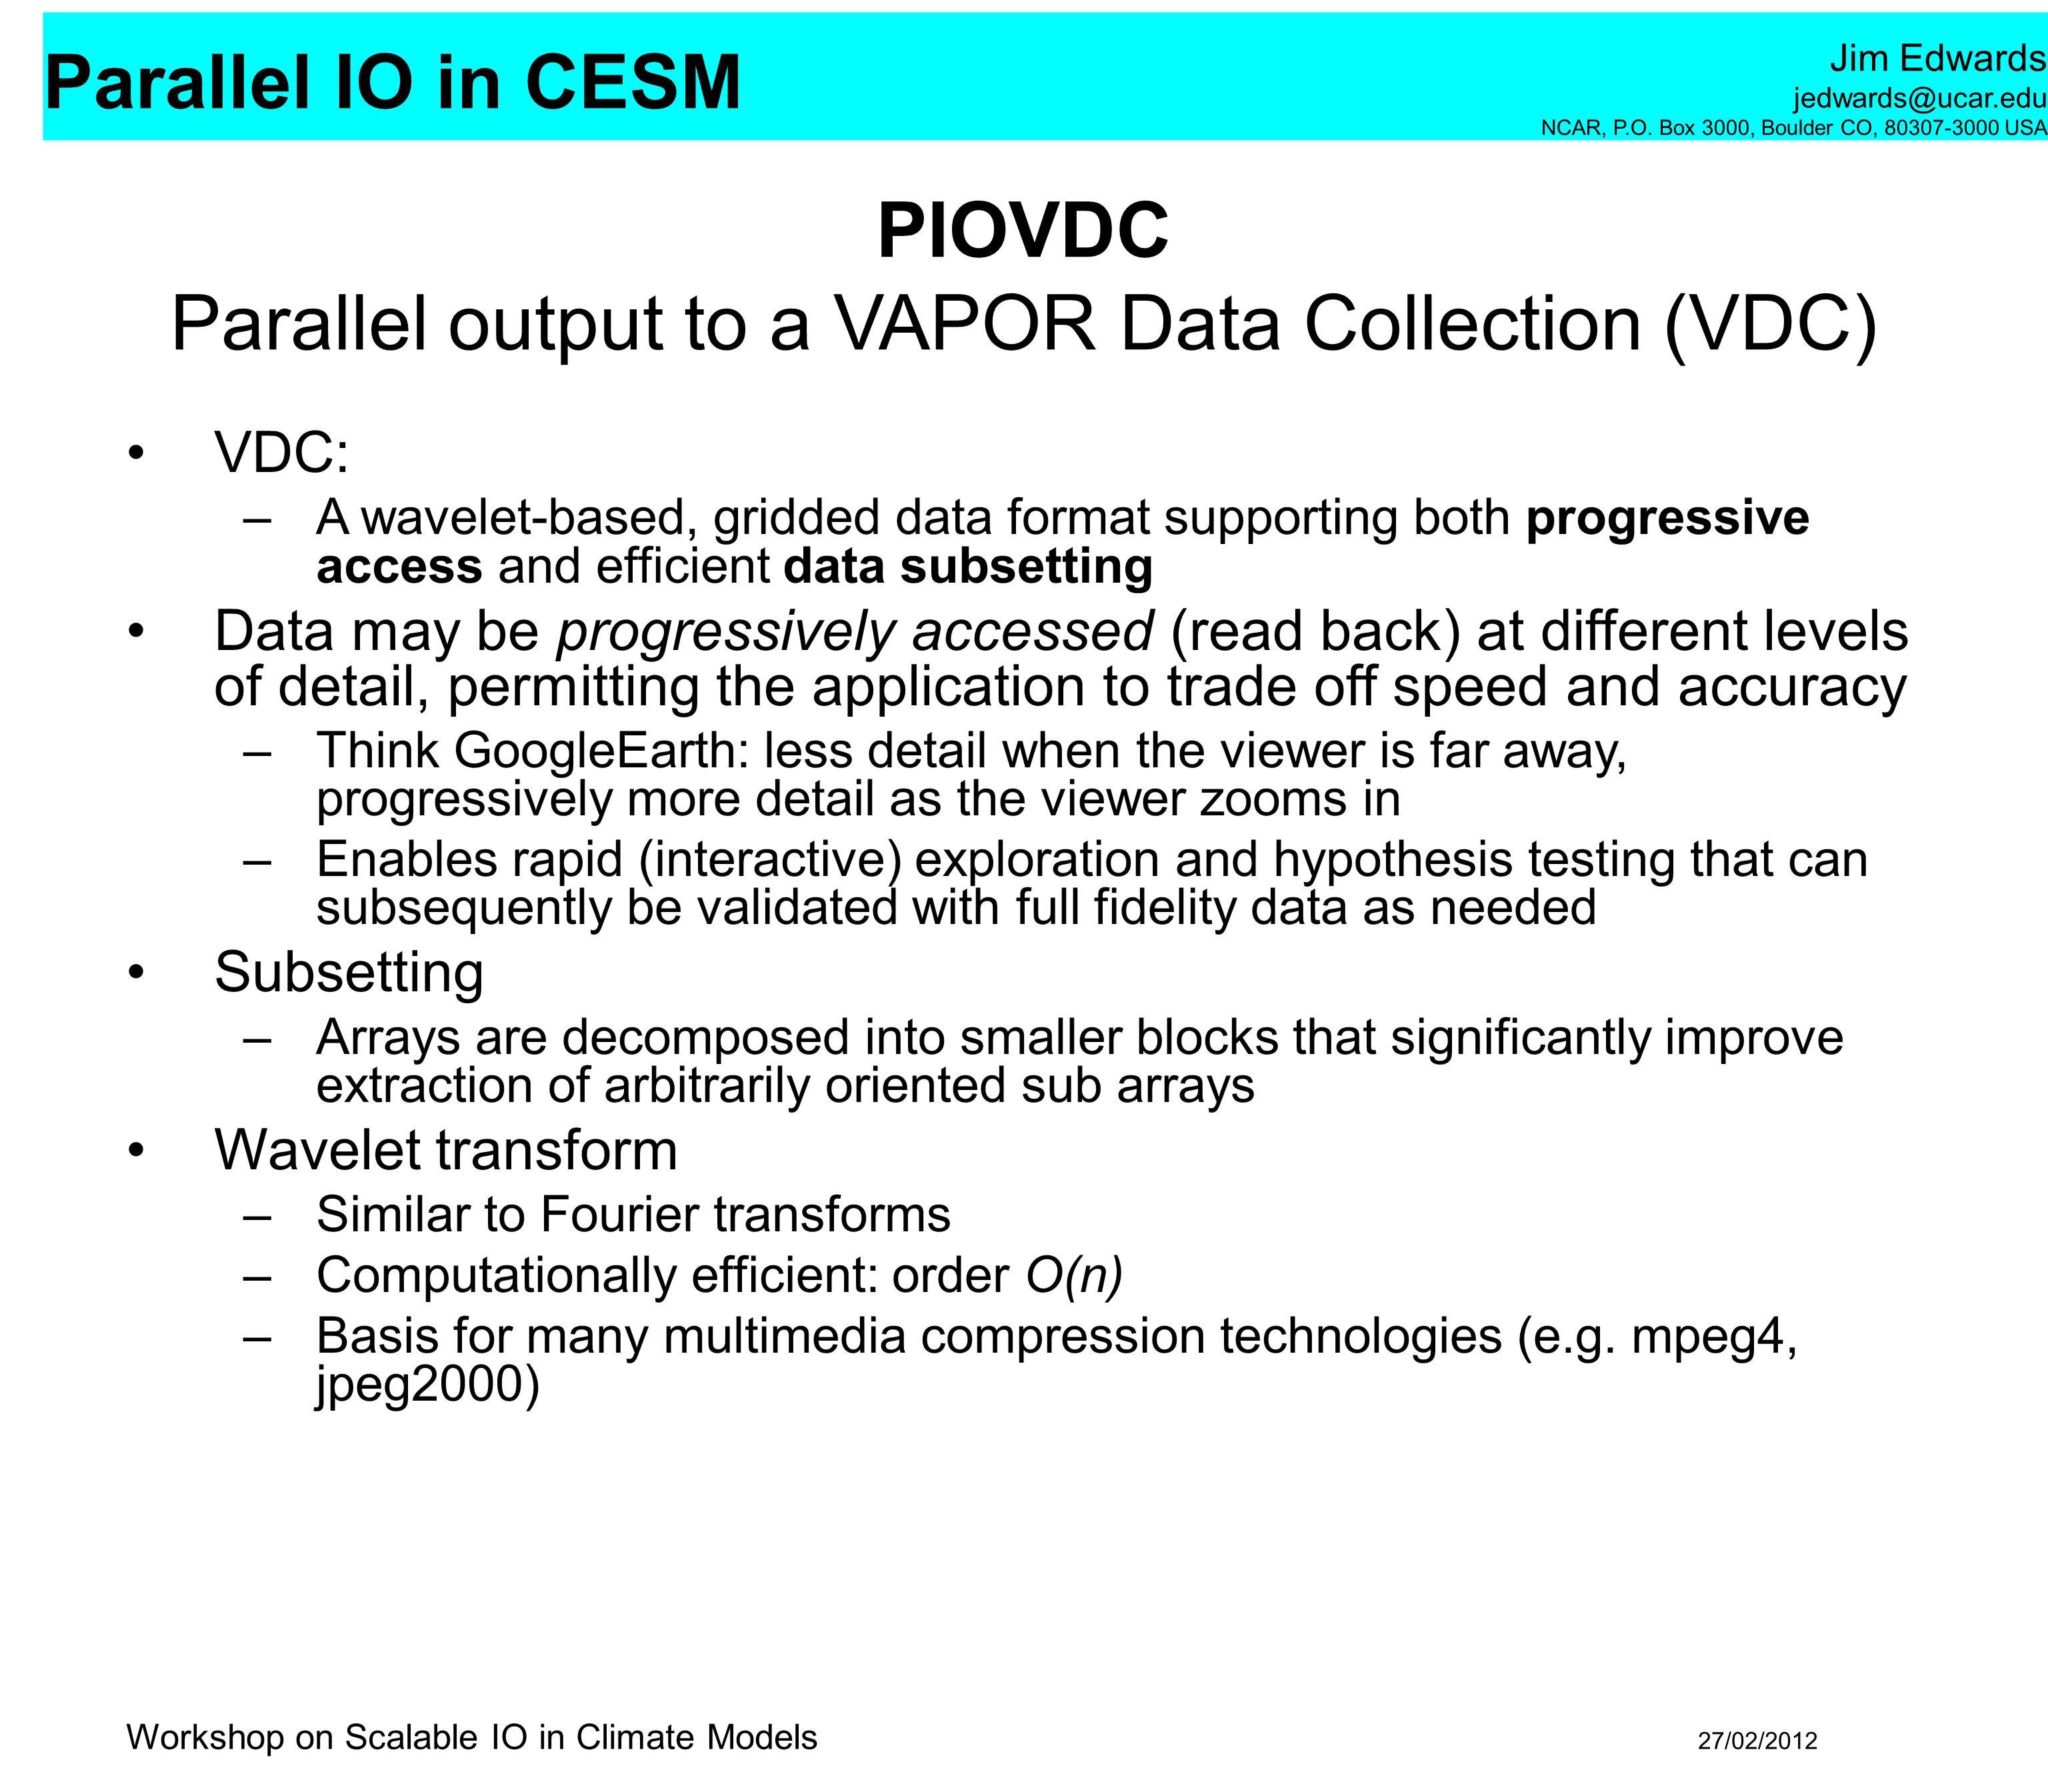 PIOVDC Parallel output to a VAPOR Data Collection (VDC)